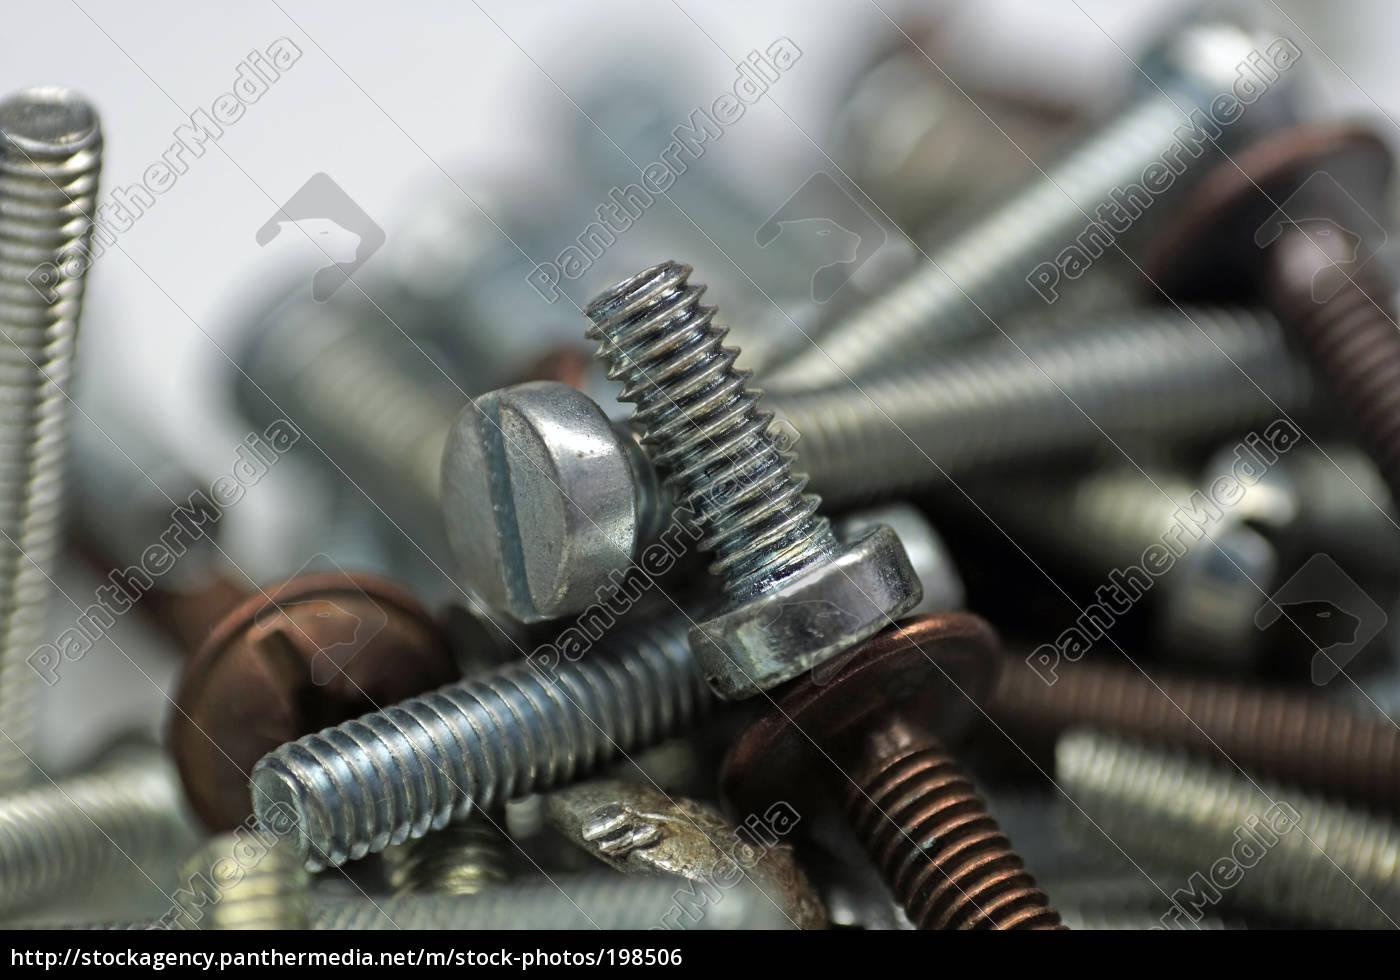 screw, -, 3 - 198506